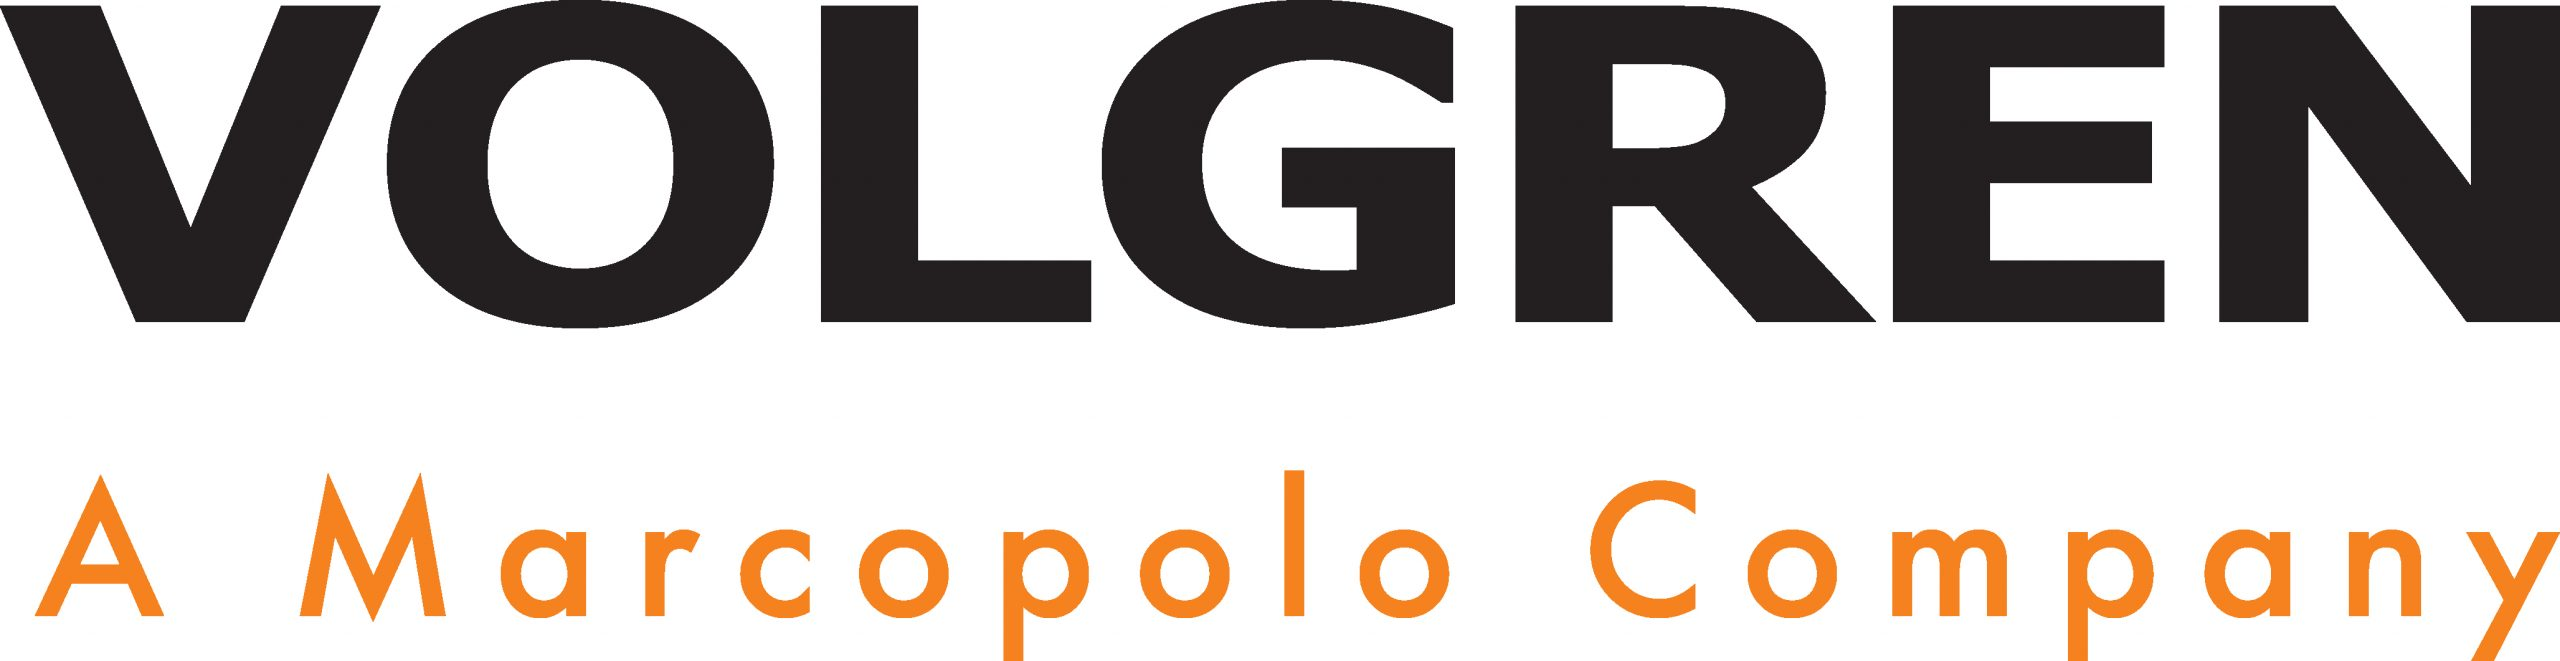 Volgren A Marcopolo Company Logo